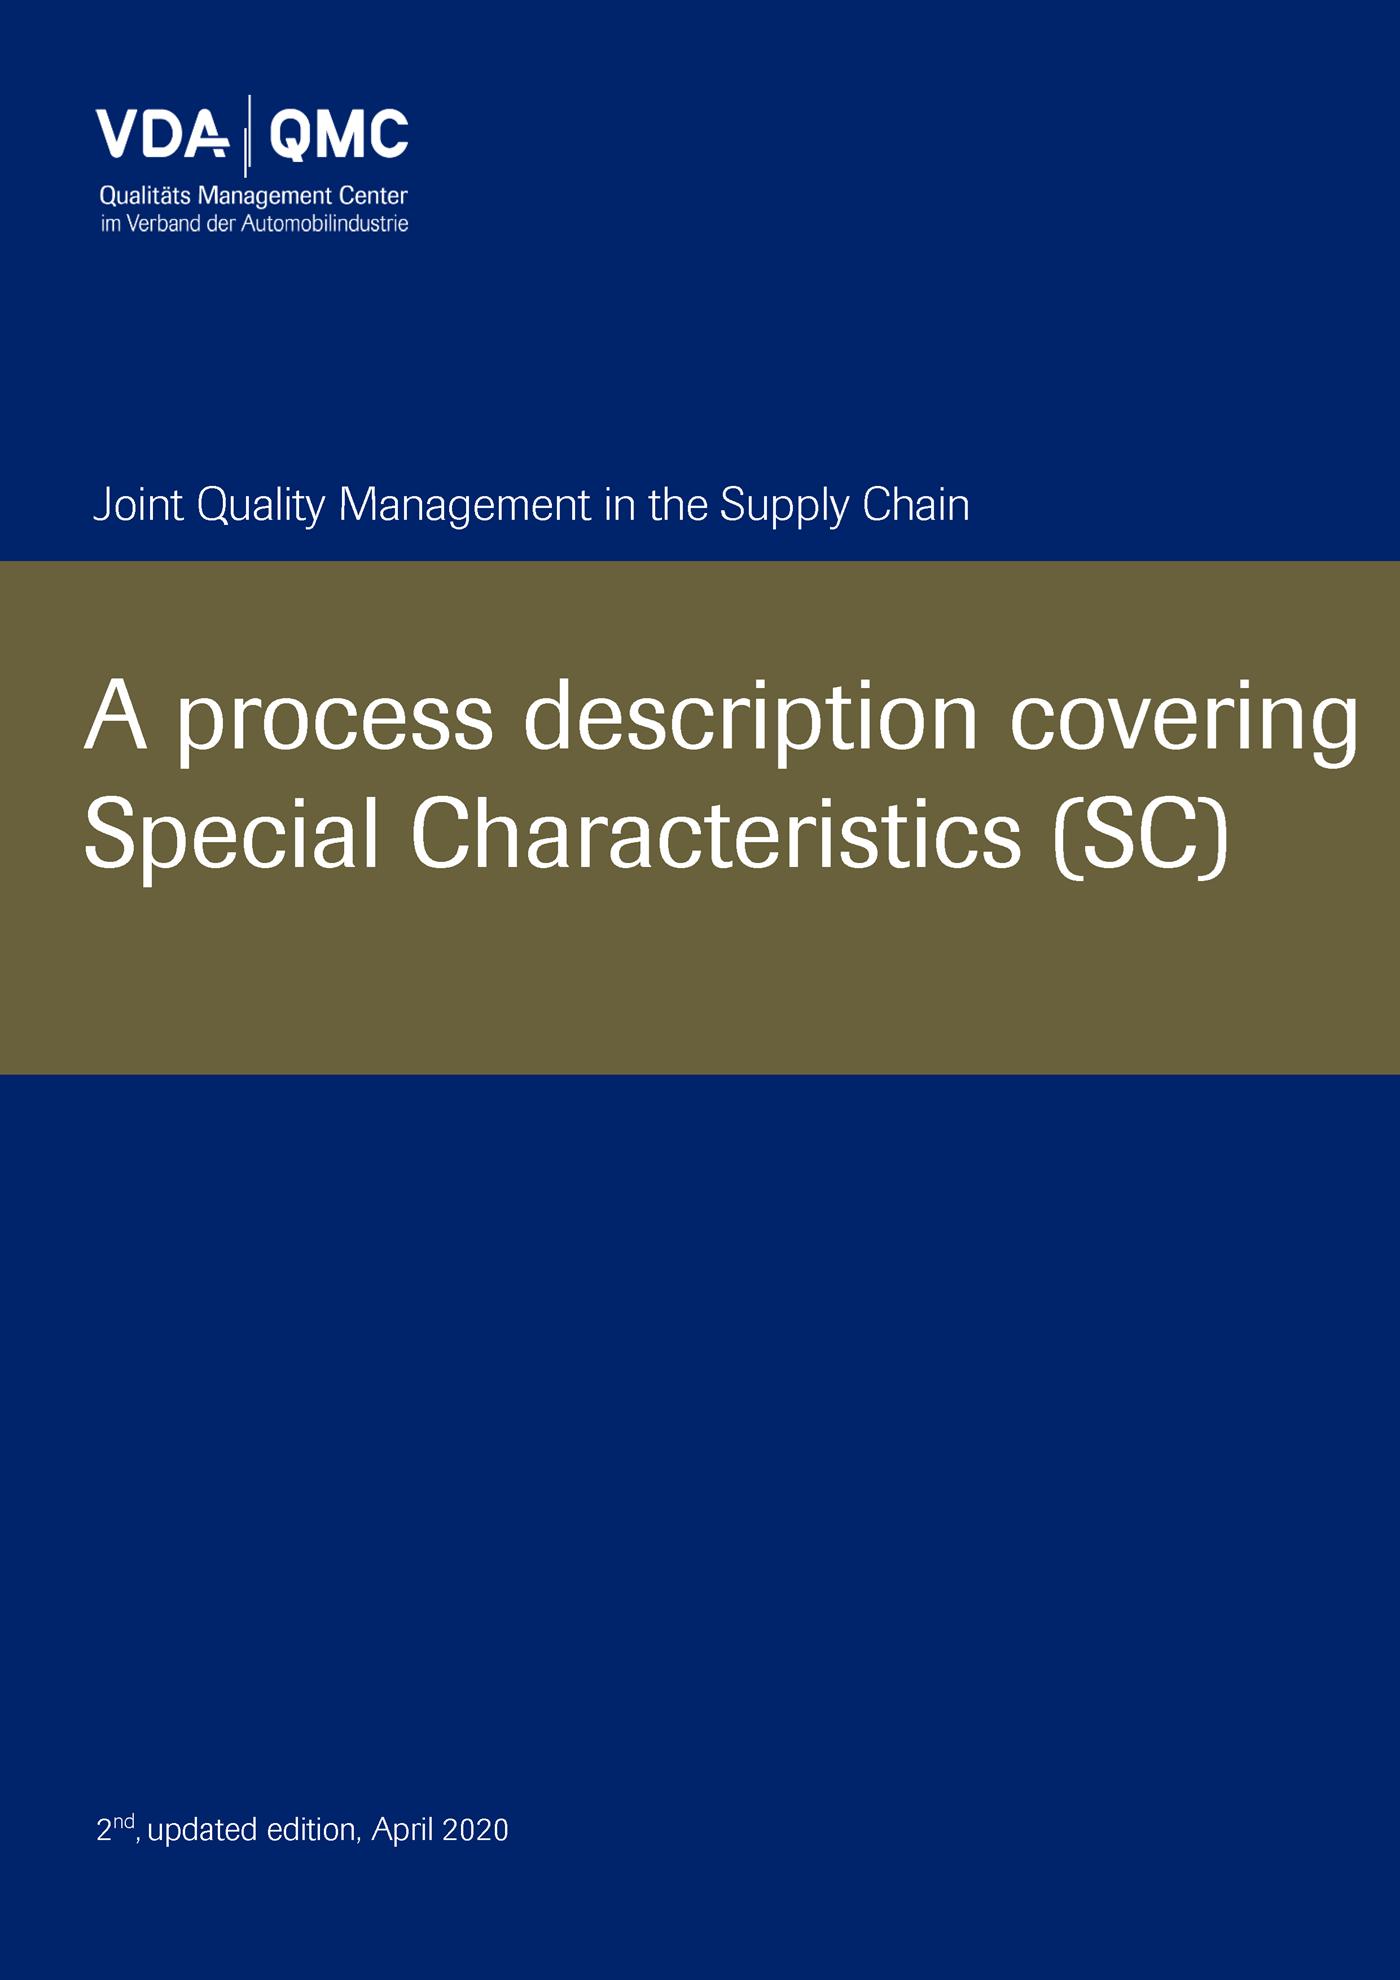 Bild von Special Characteristics (SC) 04/2020